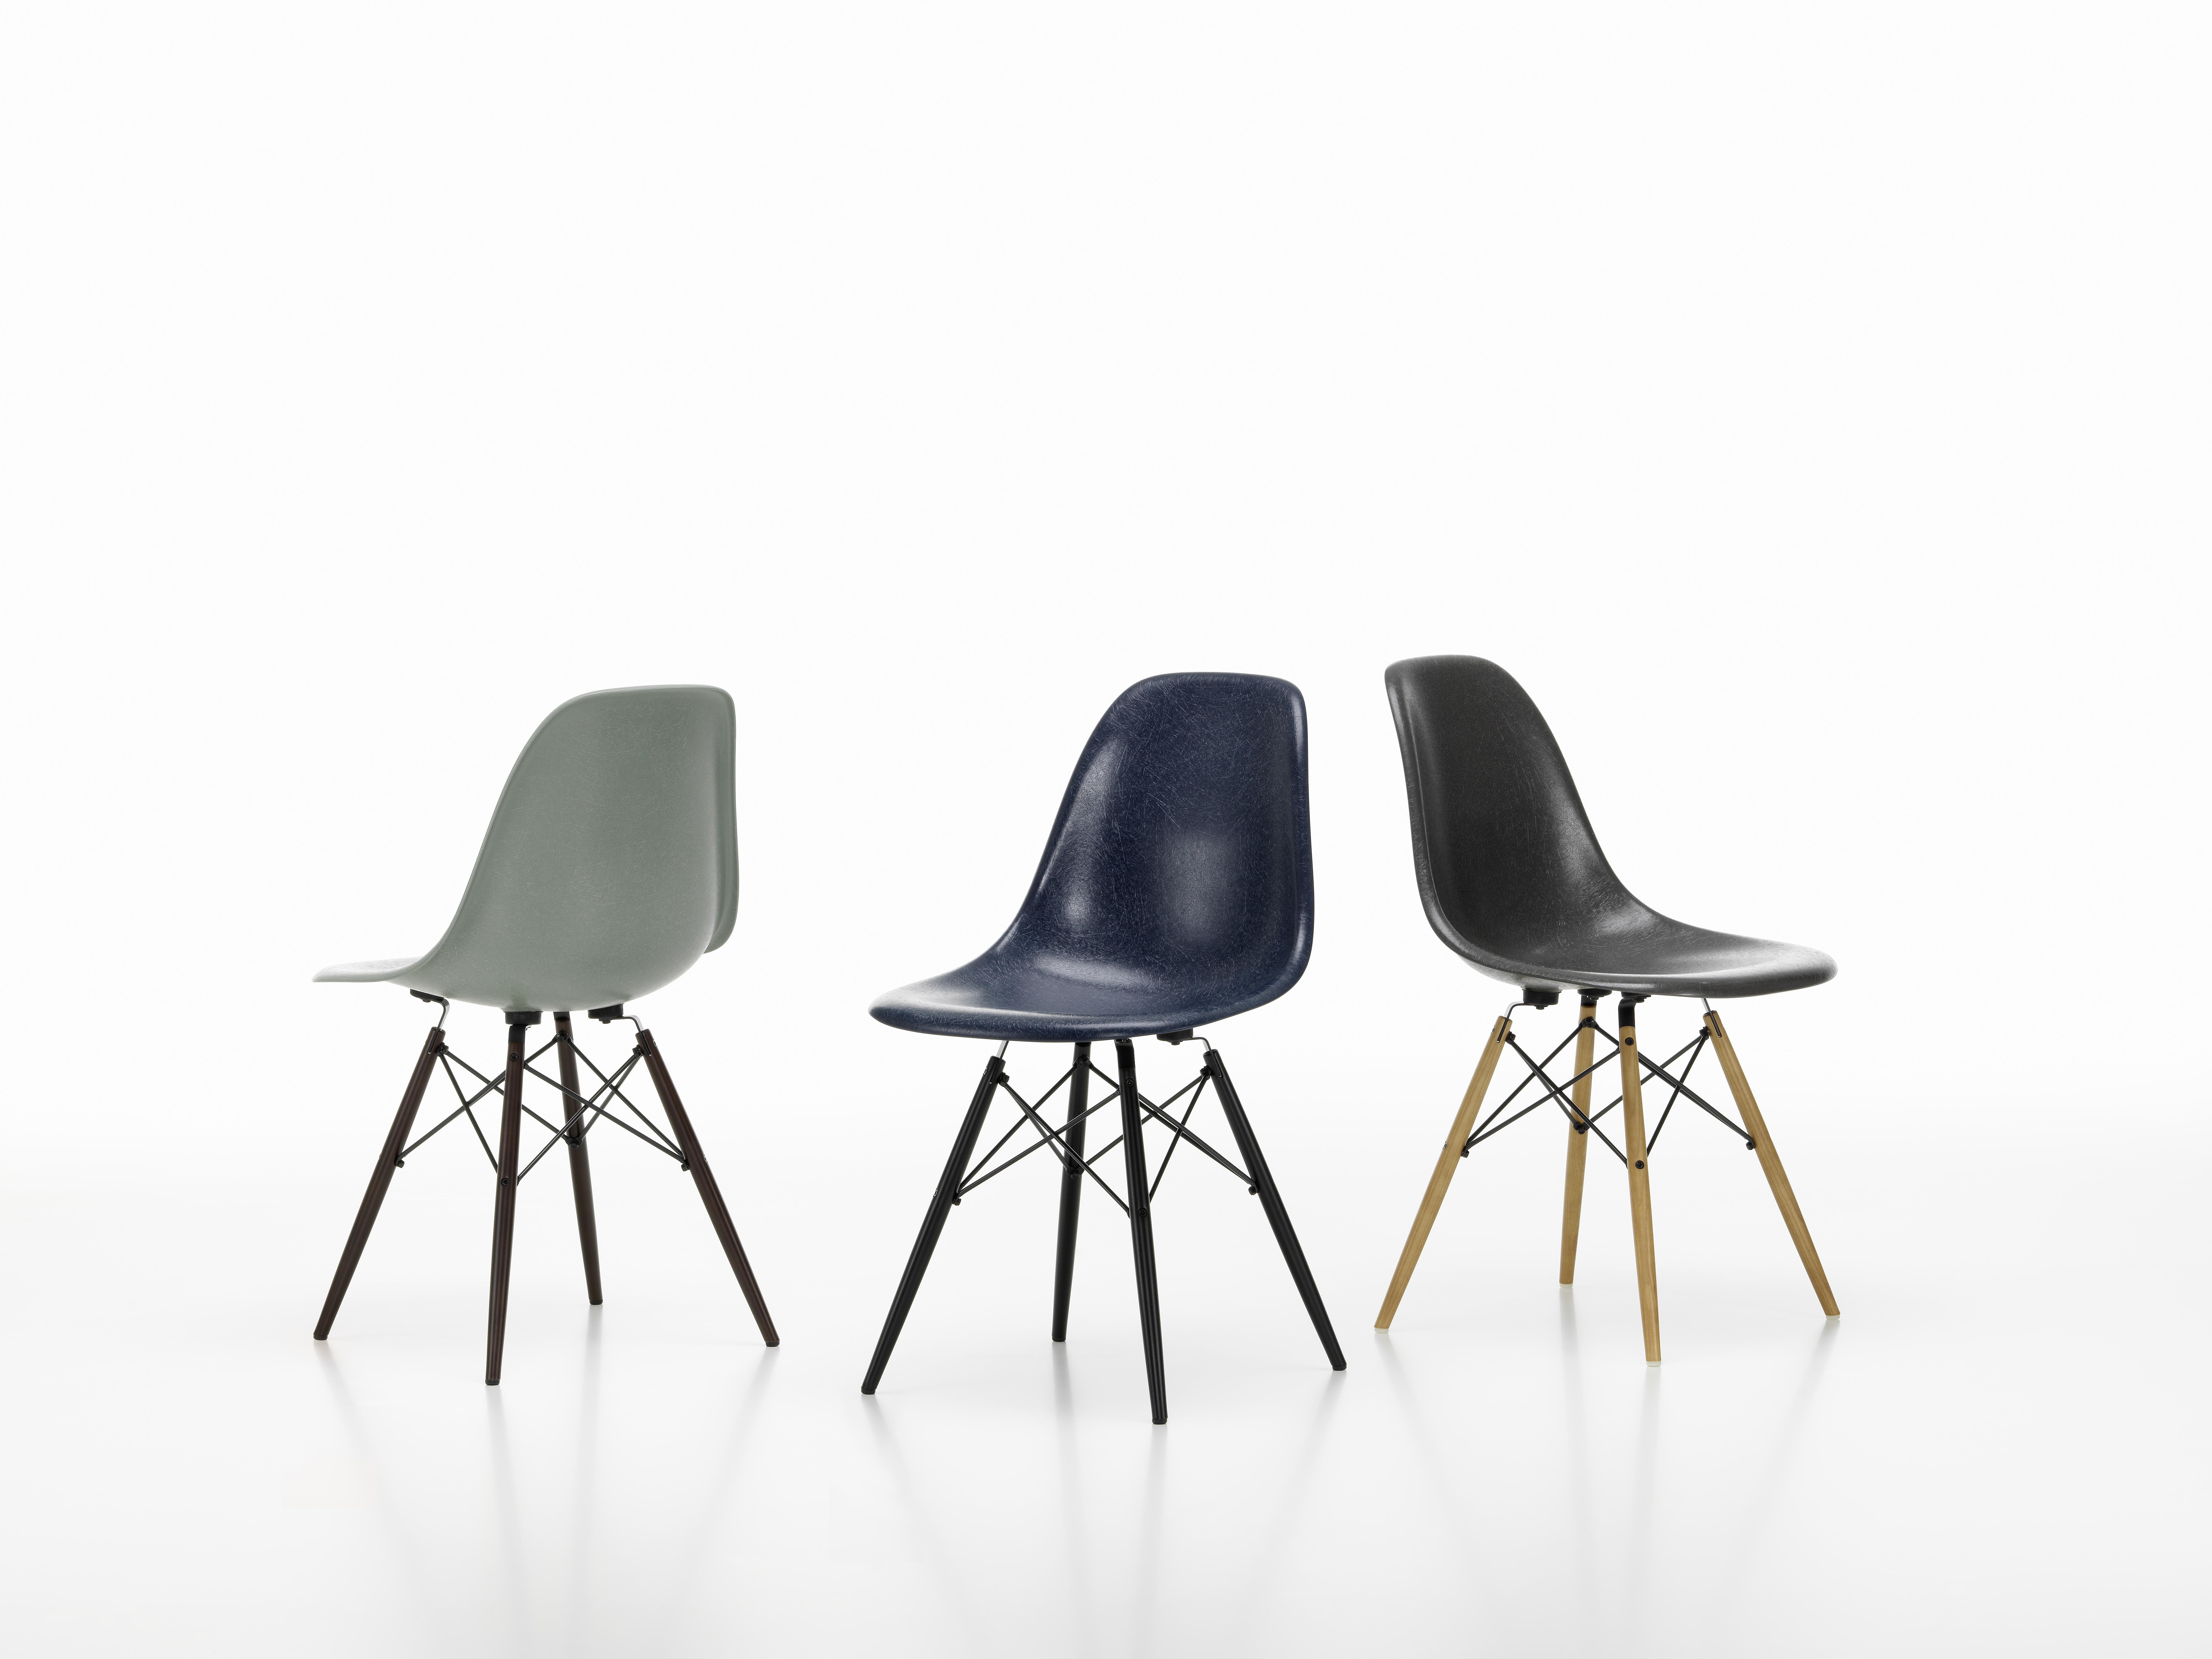 Eames Fiberglass Chair · Eames Fiberglass Chair ...